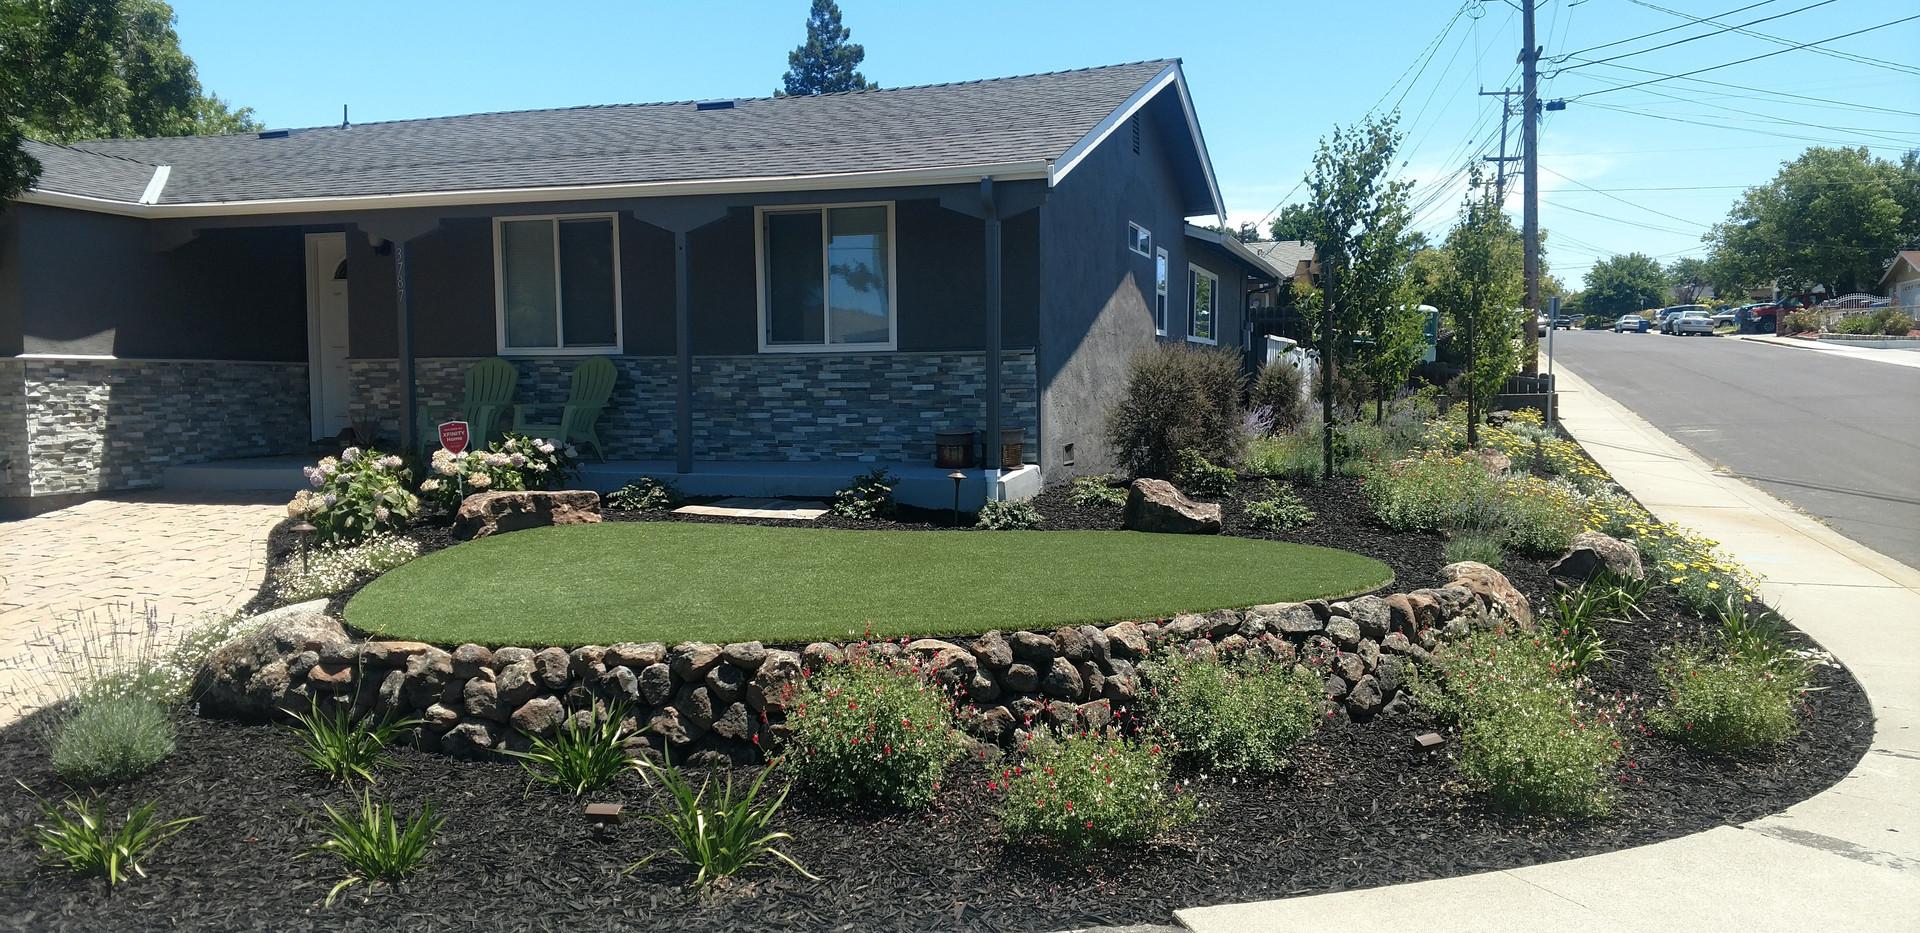 Quality garden lawn